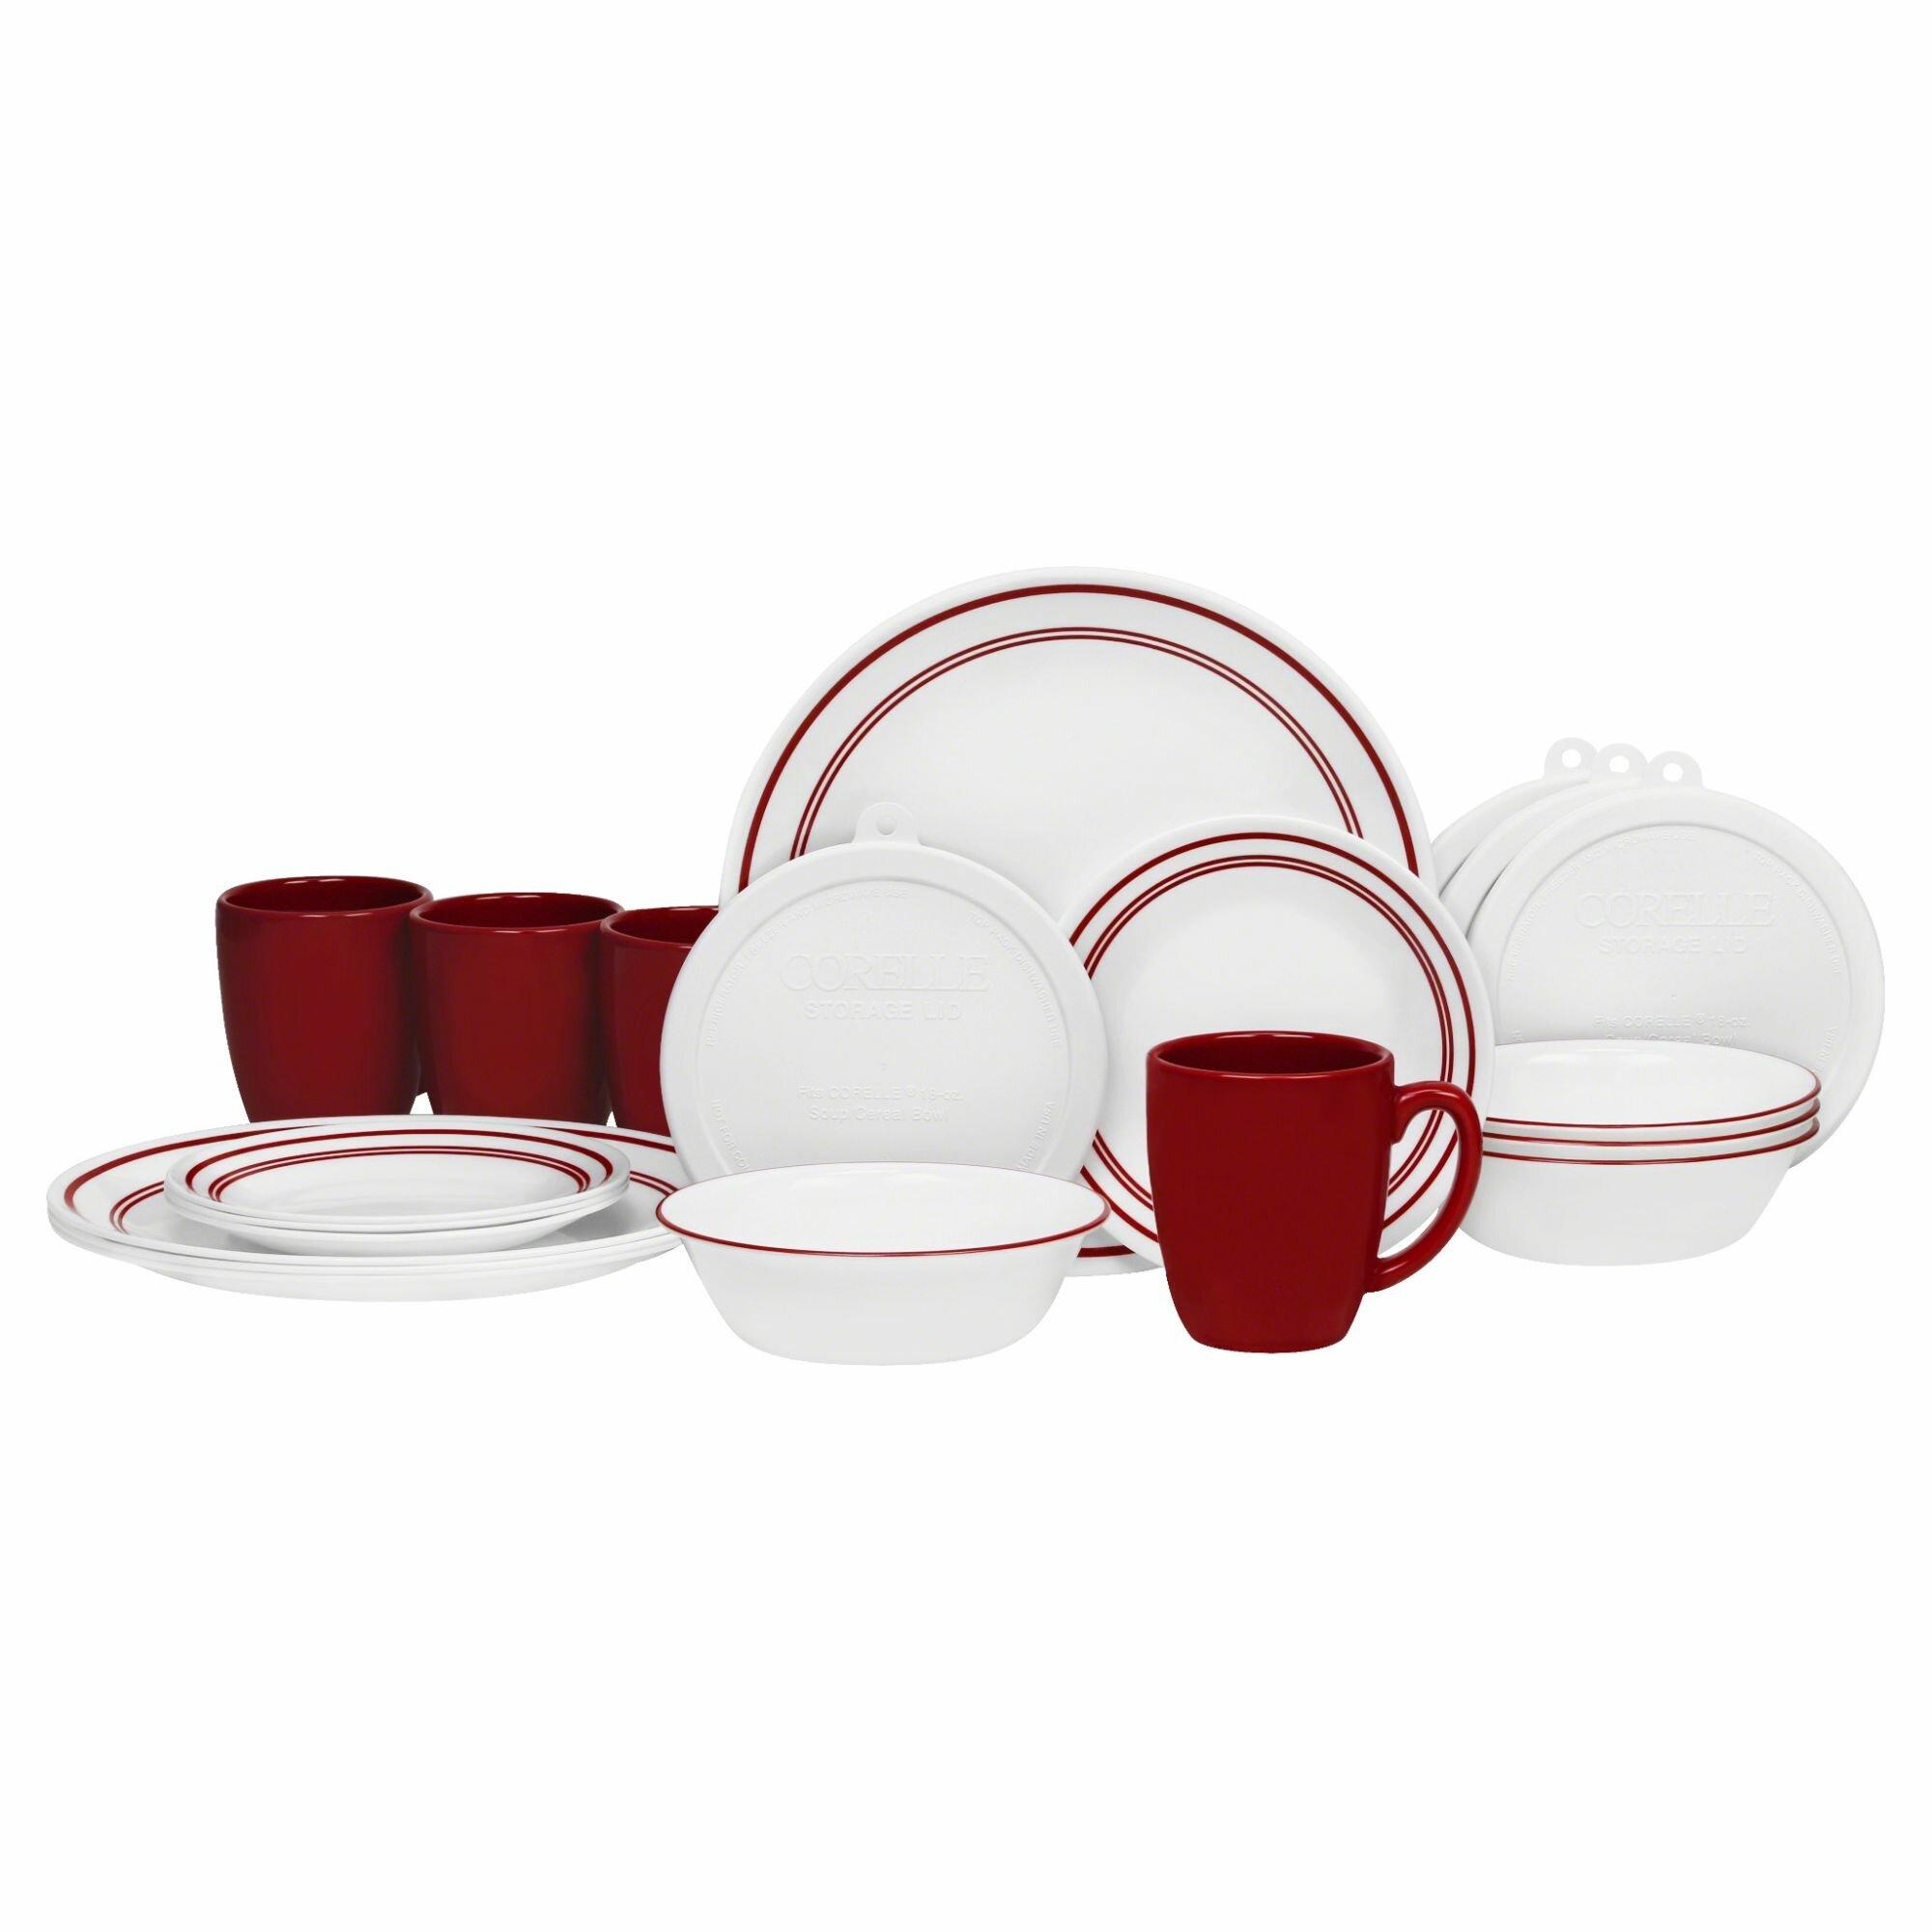 Corelle Livingware Classic Cafe 20 Piece Dinnerware Set Reviews Wayfair